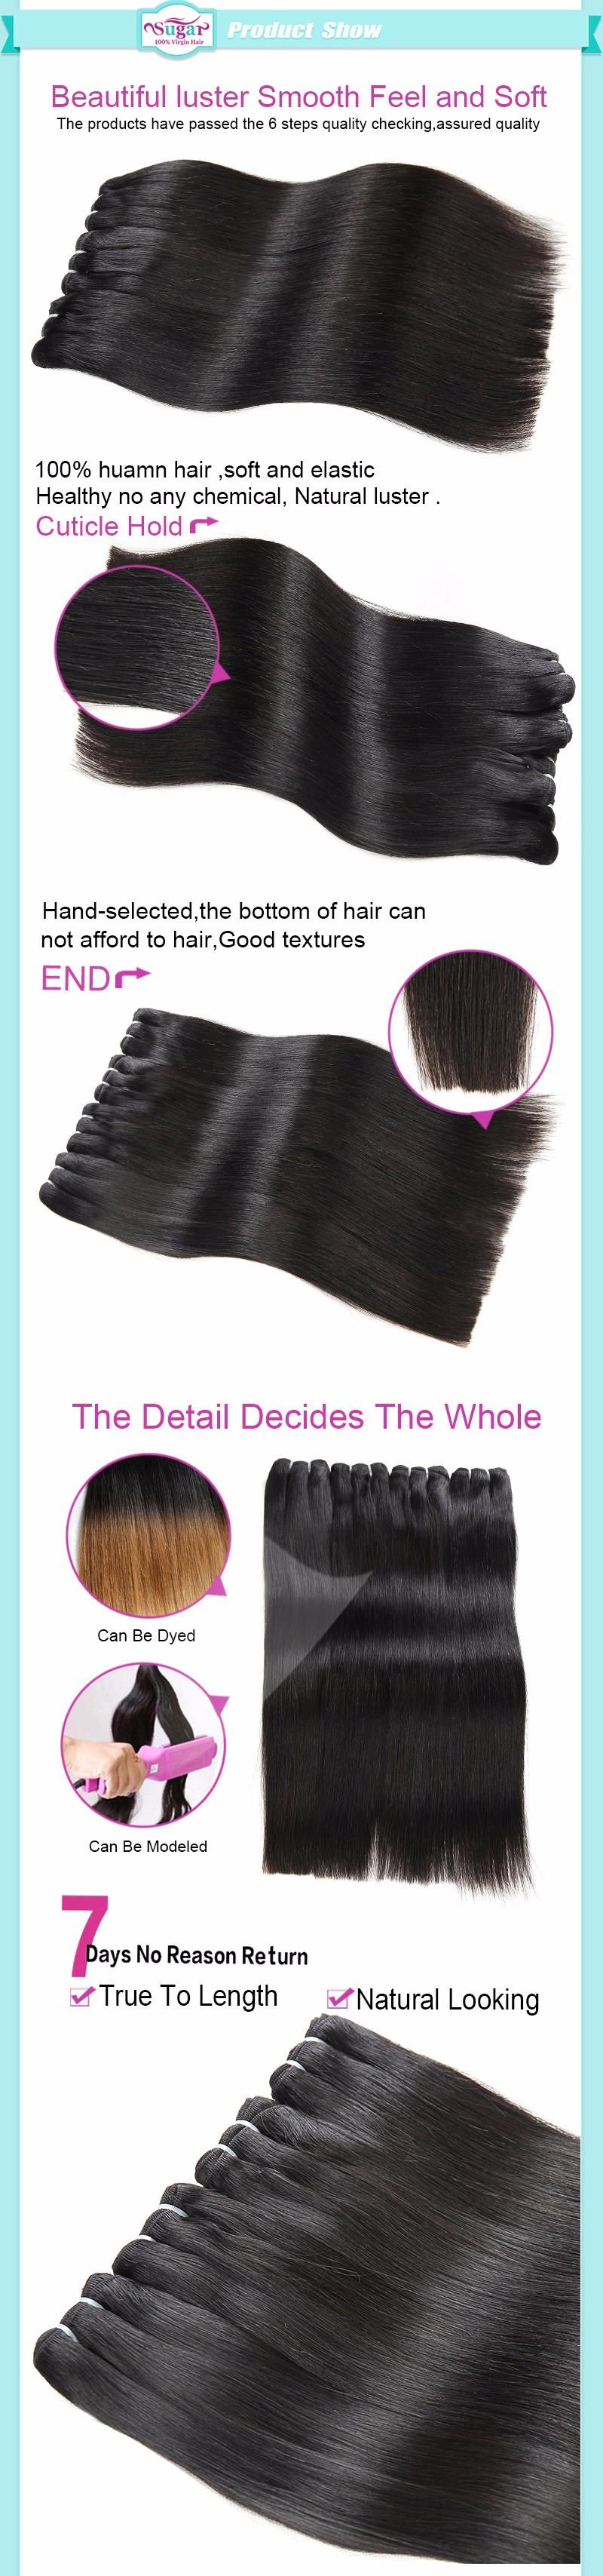 straight-Hair_03